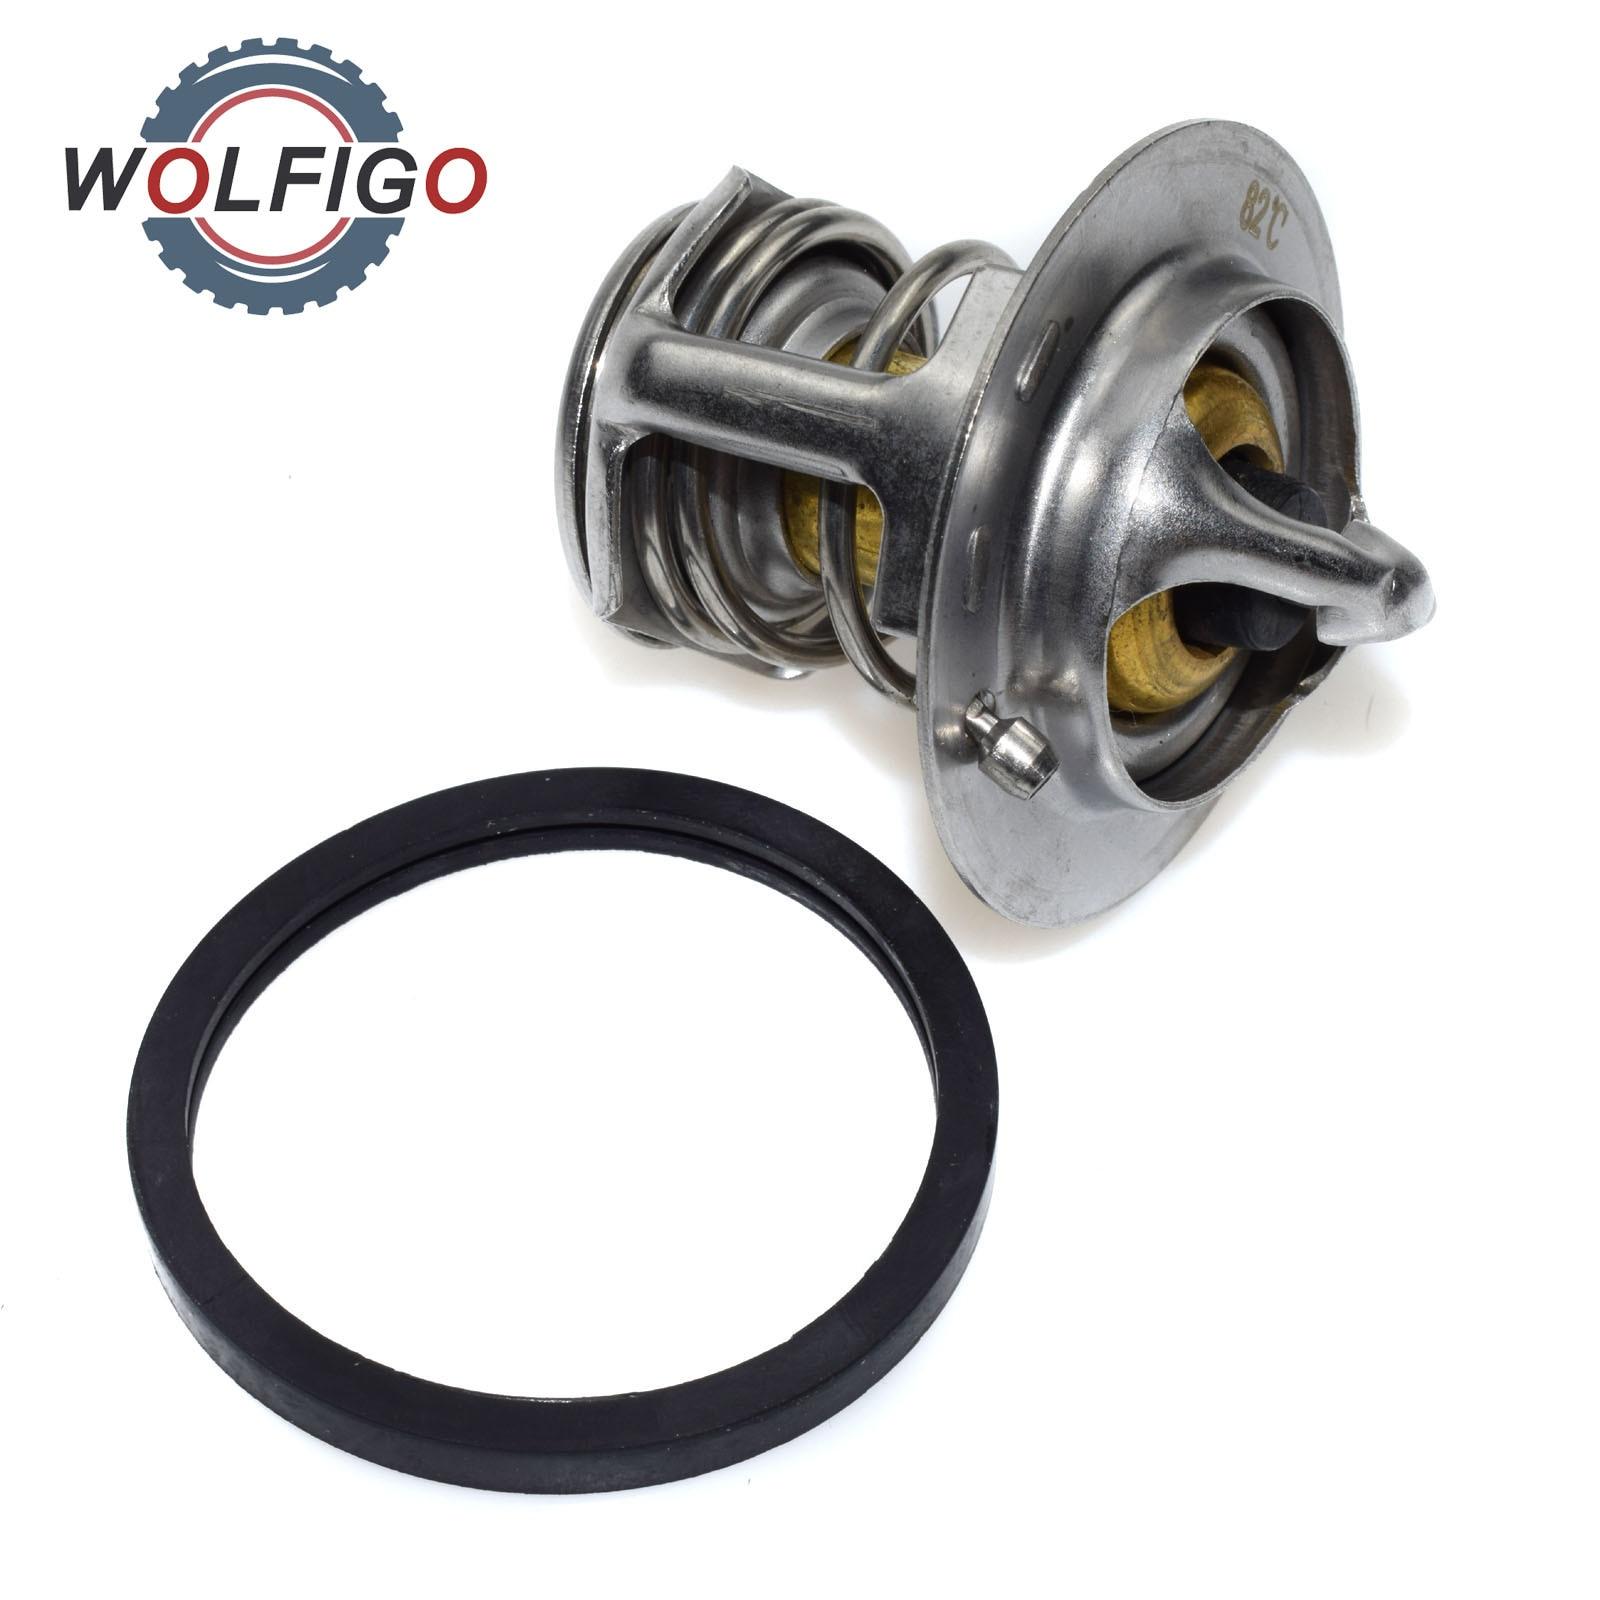 Wolfigo Engine Coolant Thermostat 9091603046 For Toyota